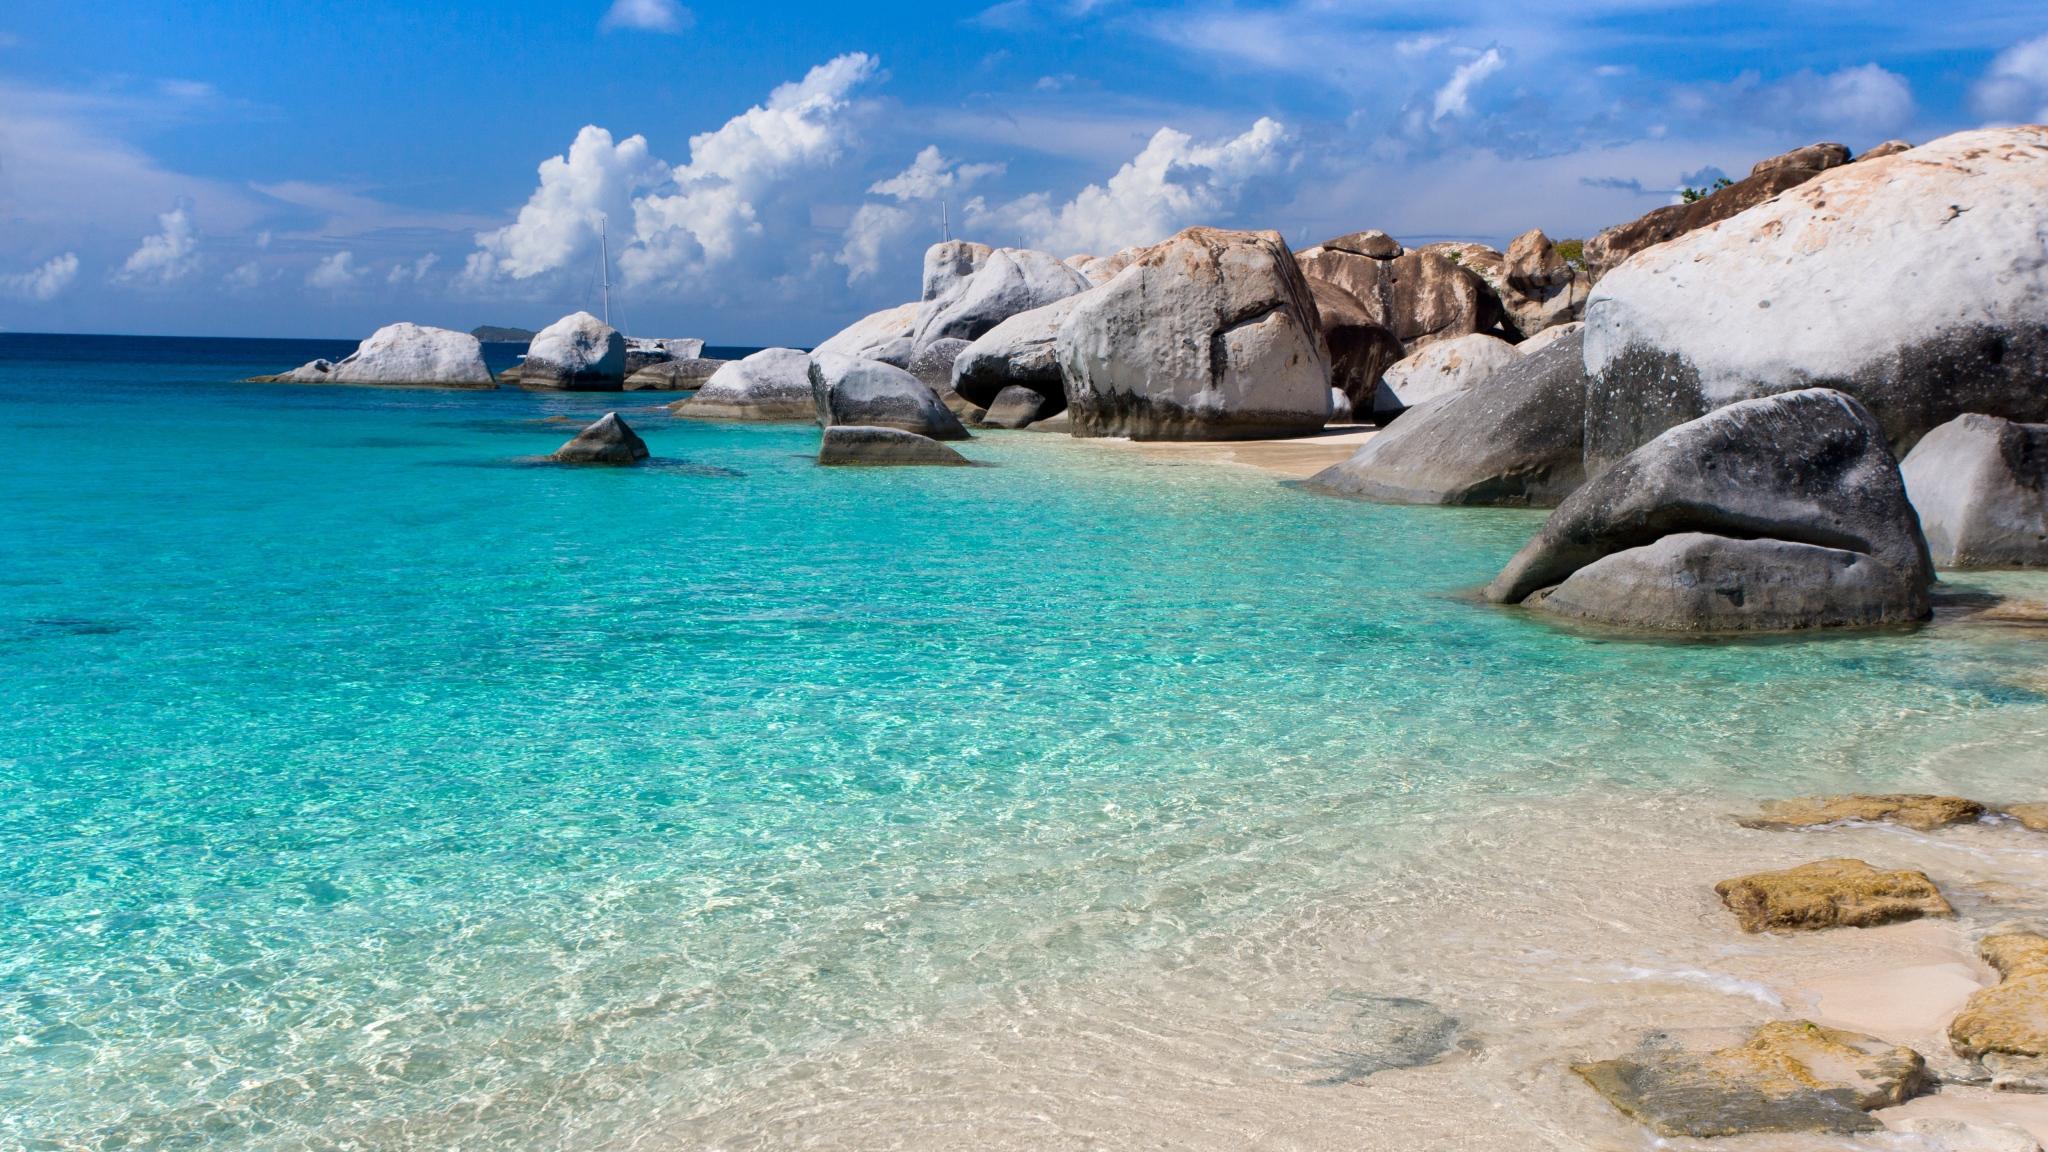 залив камни голубая вода